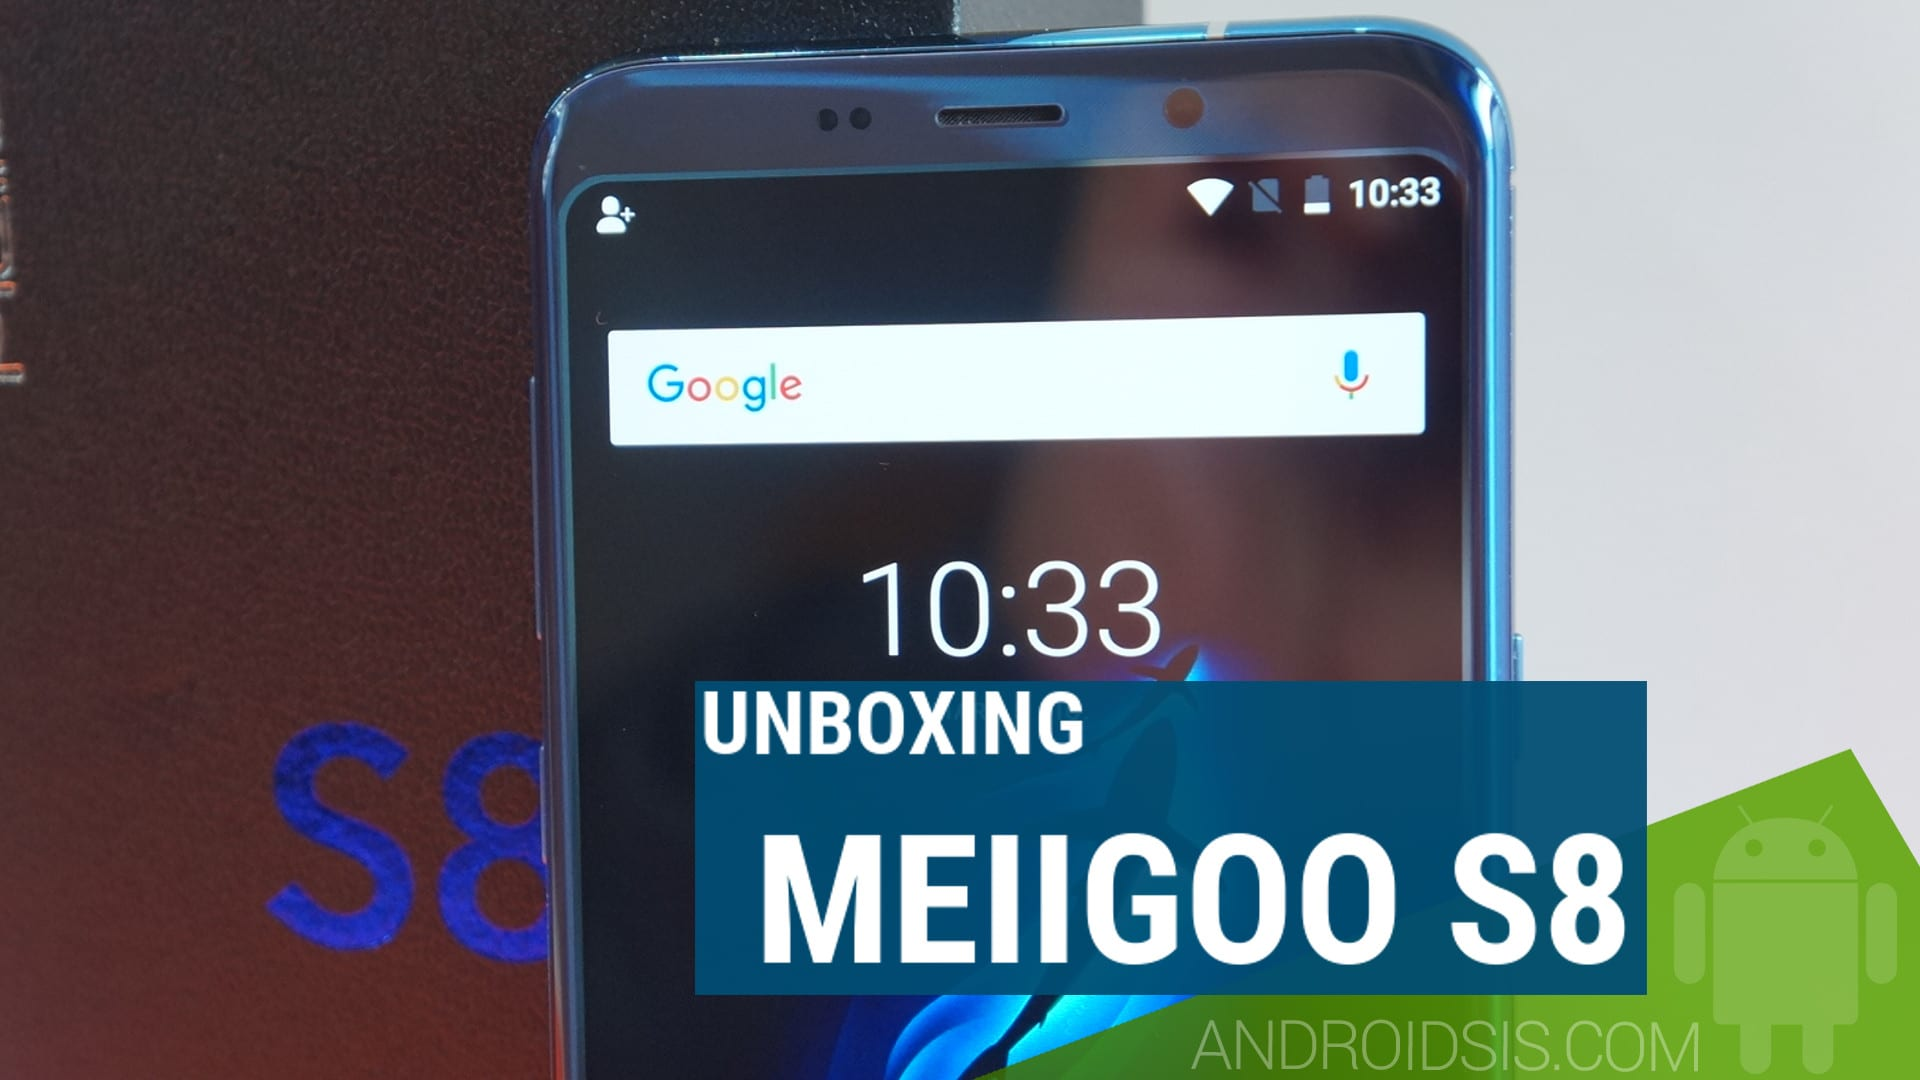 Meiigoo S8 - Unboxing del mejor clon del Samsung Galaxy S8 Plus